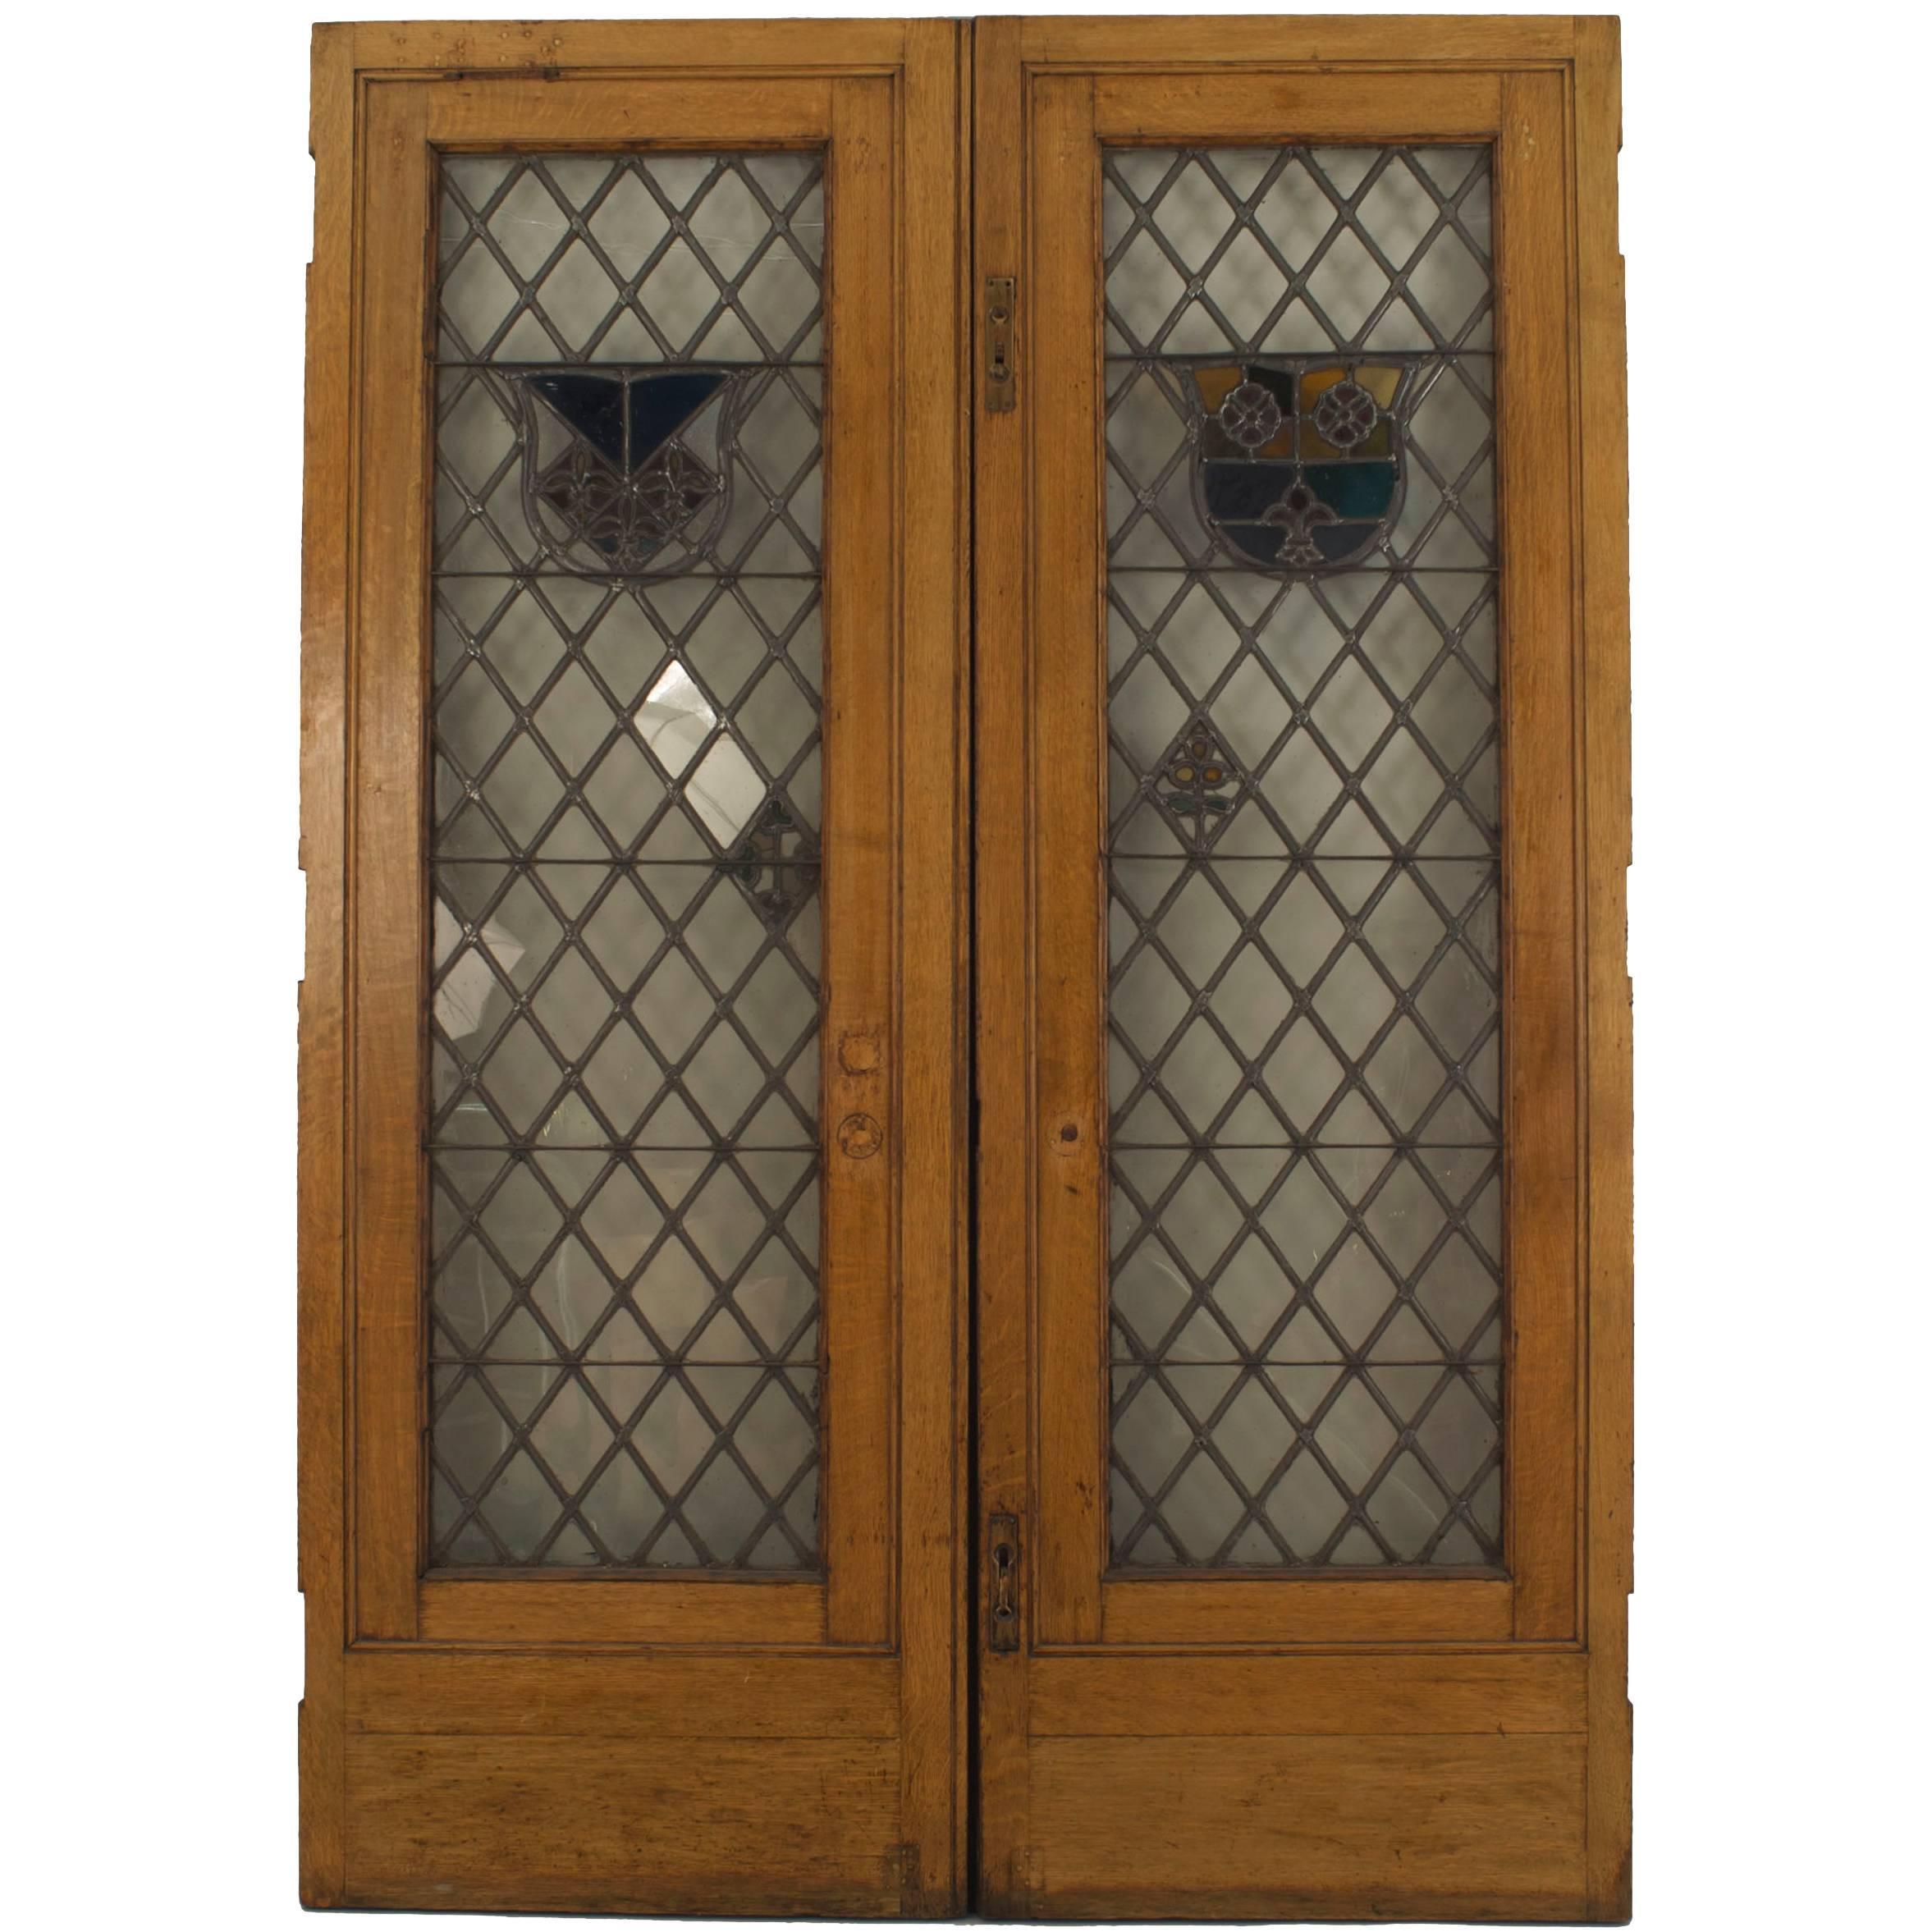 Large Pair of 19th c. American Leaded Glass Golden Oak Doors